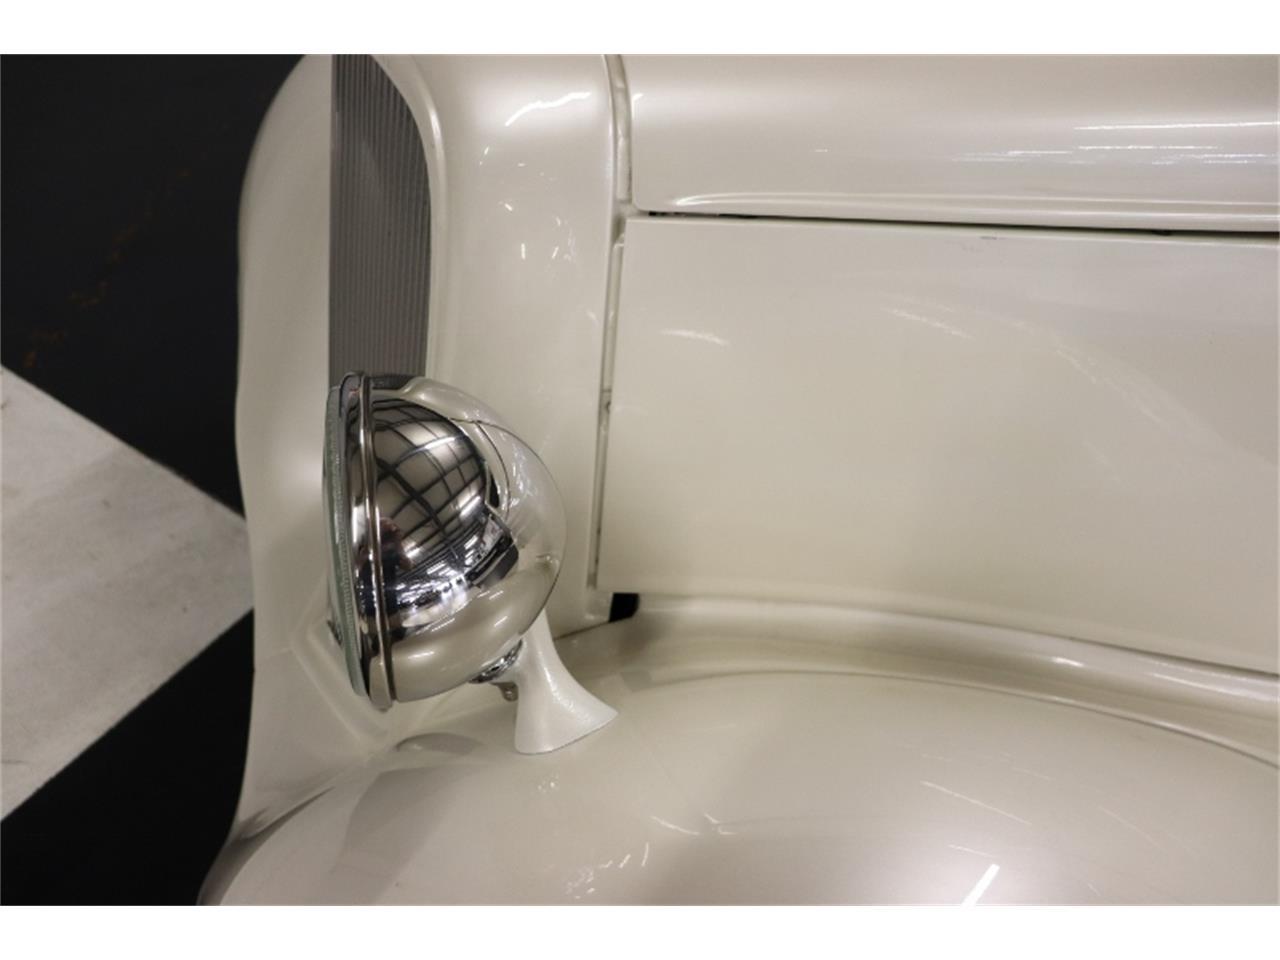 1935 Chevrolet Sedan (CC-1386290) for sale in Lillington, North Carolina